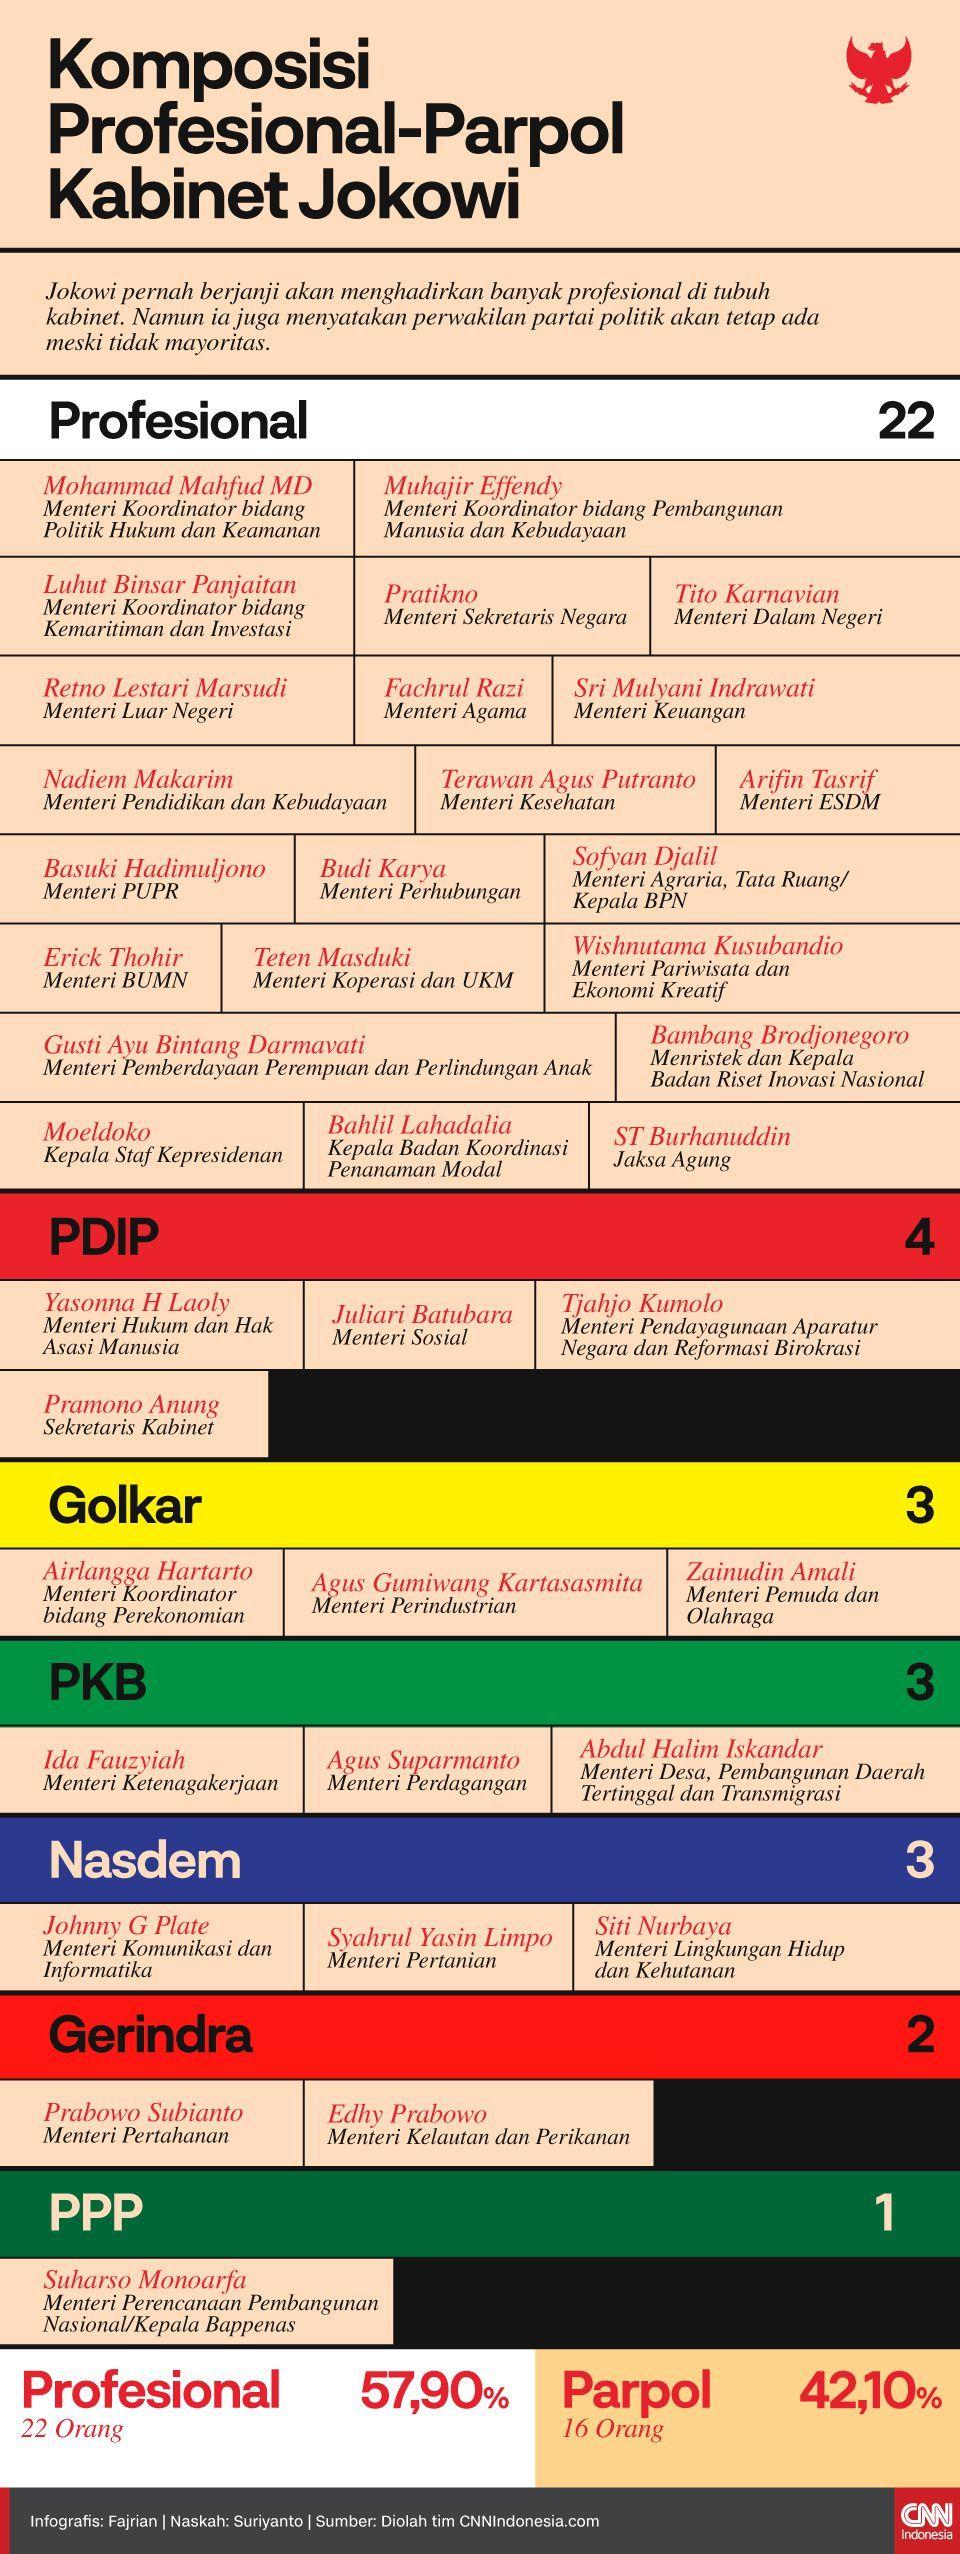 Infografis Komposisi Profesional-Parpol Kabinet Jokowi